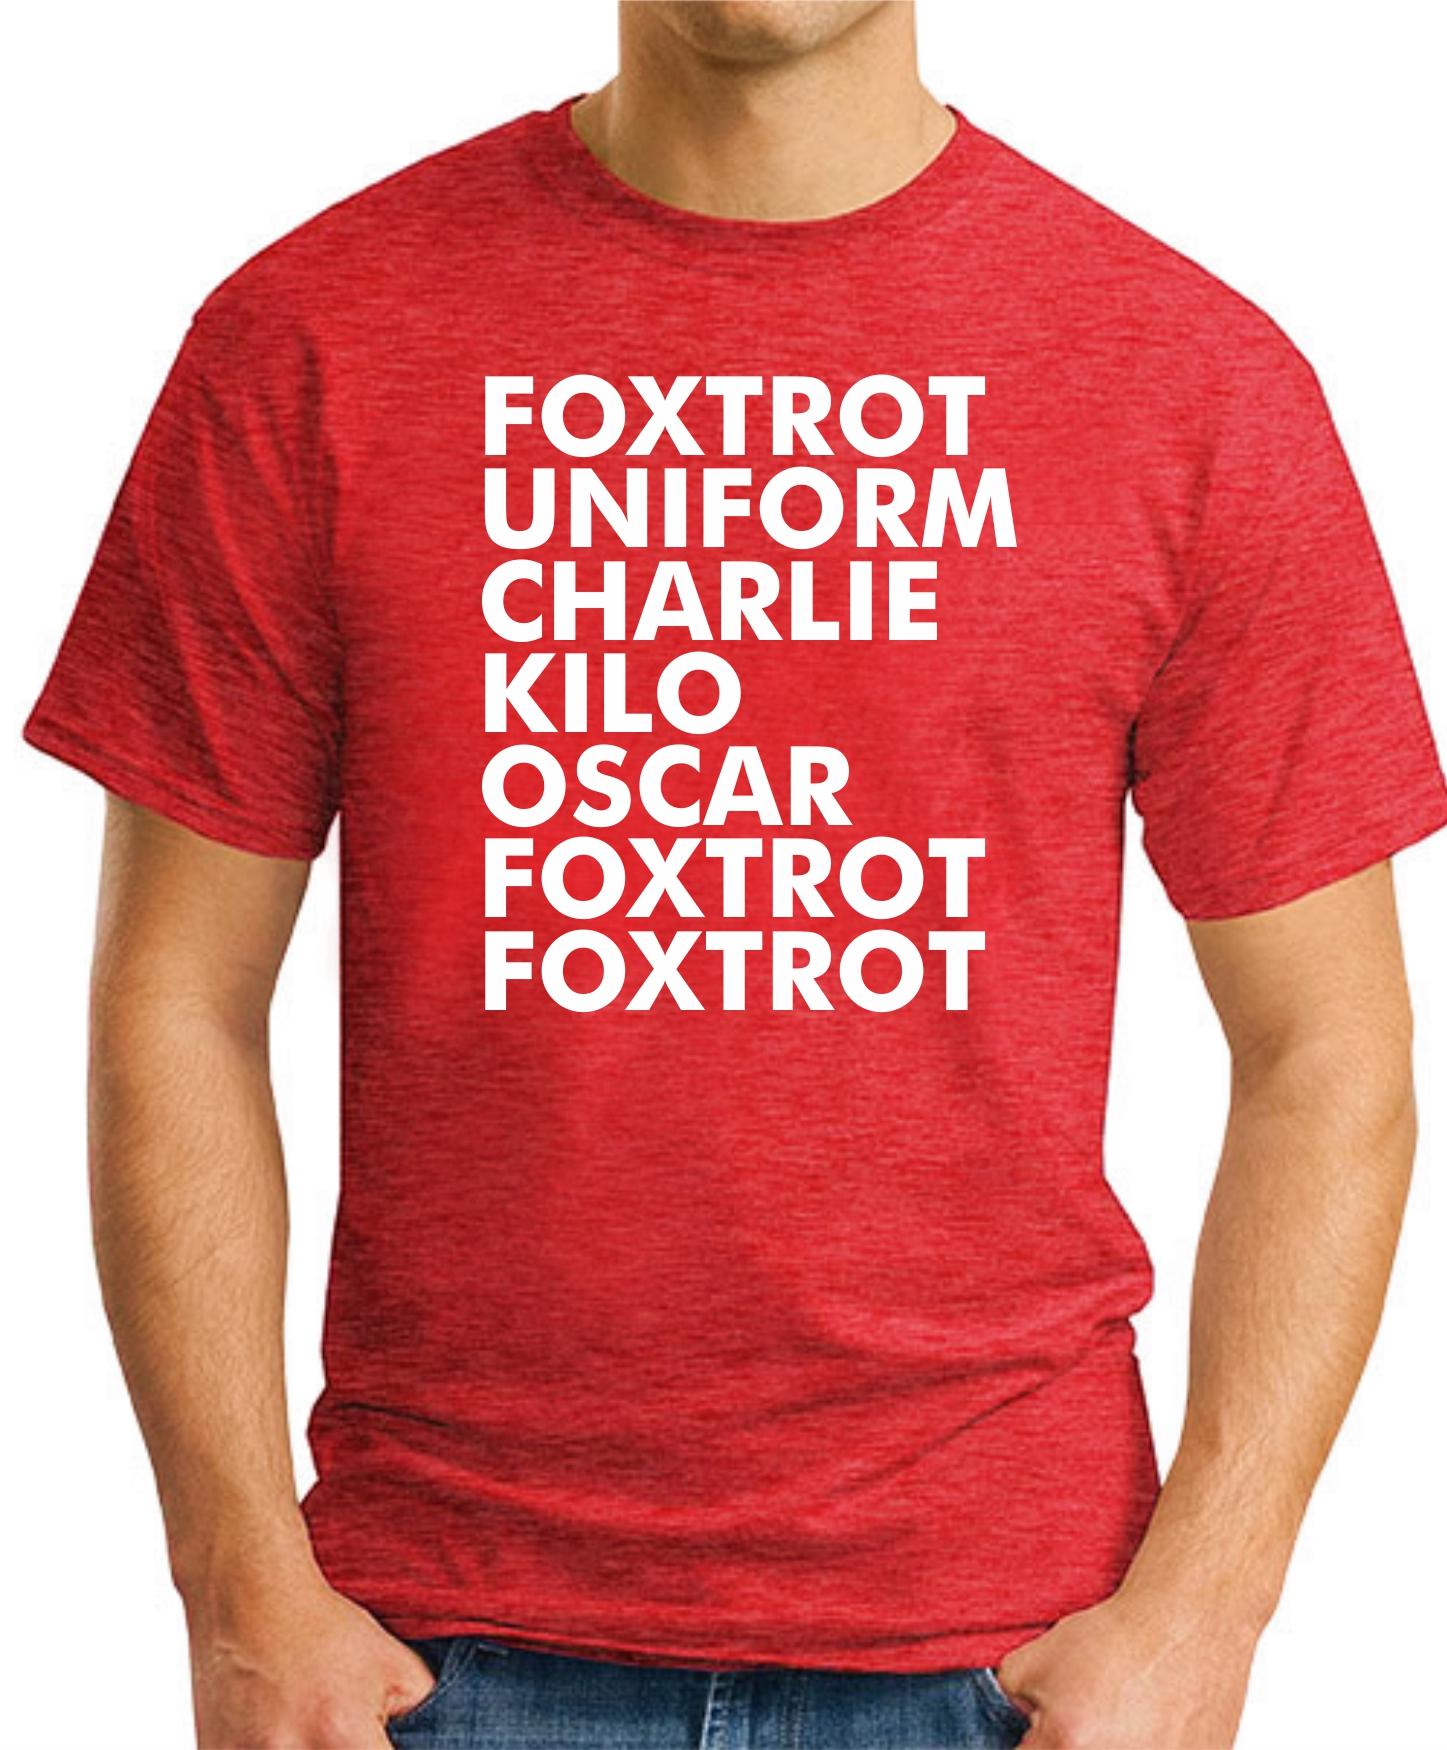 Foxtrot Uniform Charlie Kilo